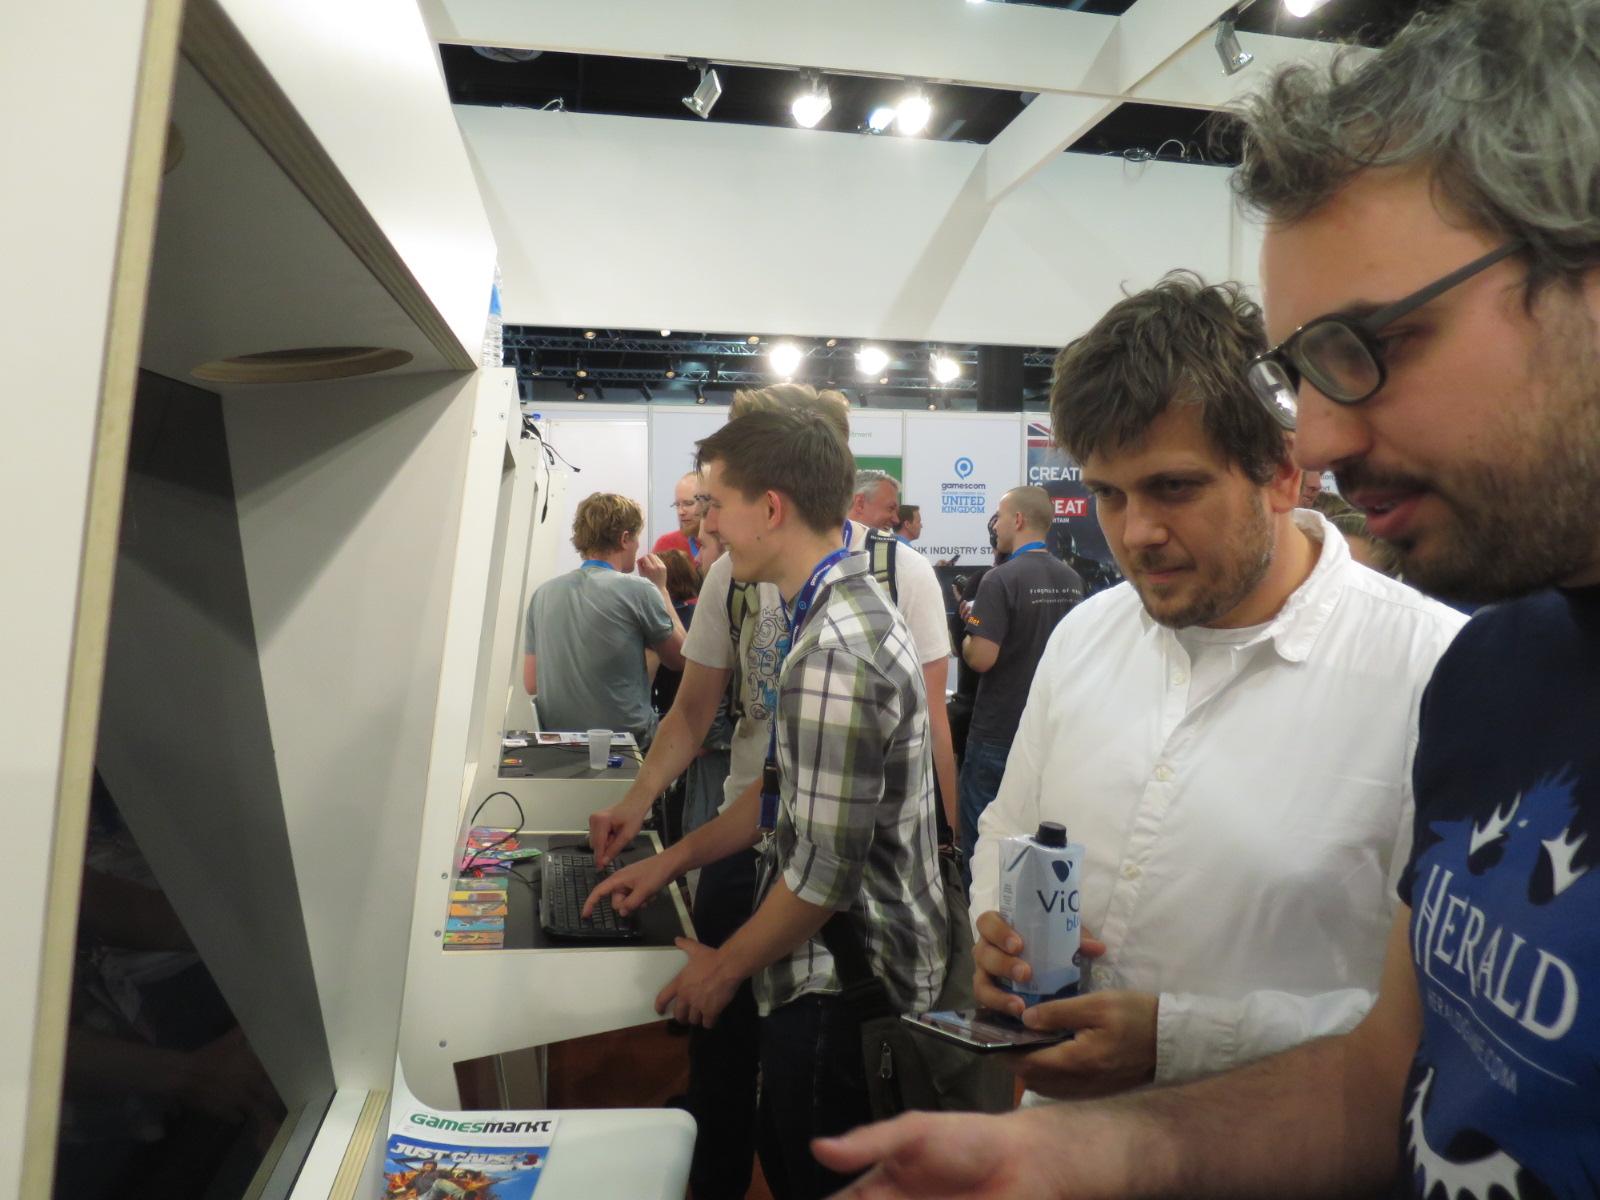 GamescomHollandPavillion.jpg